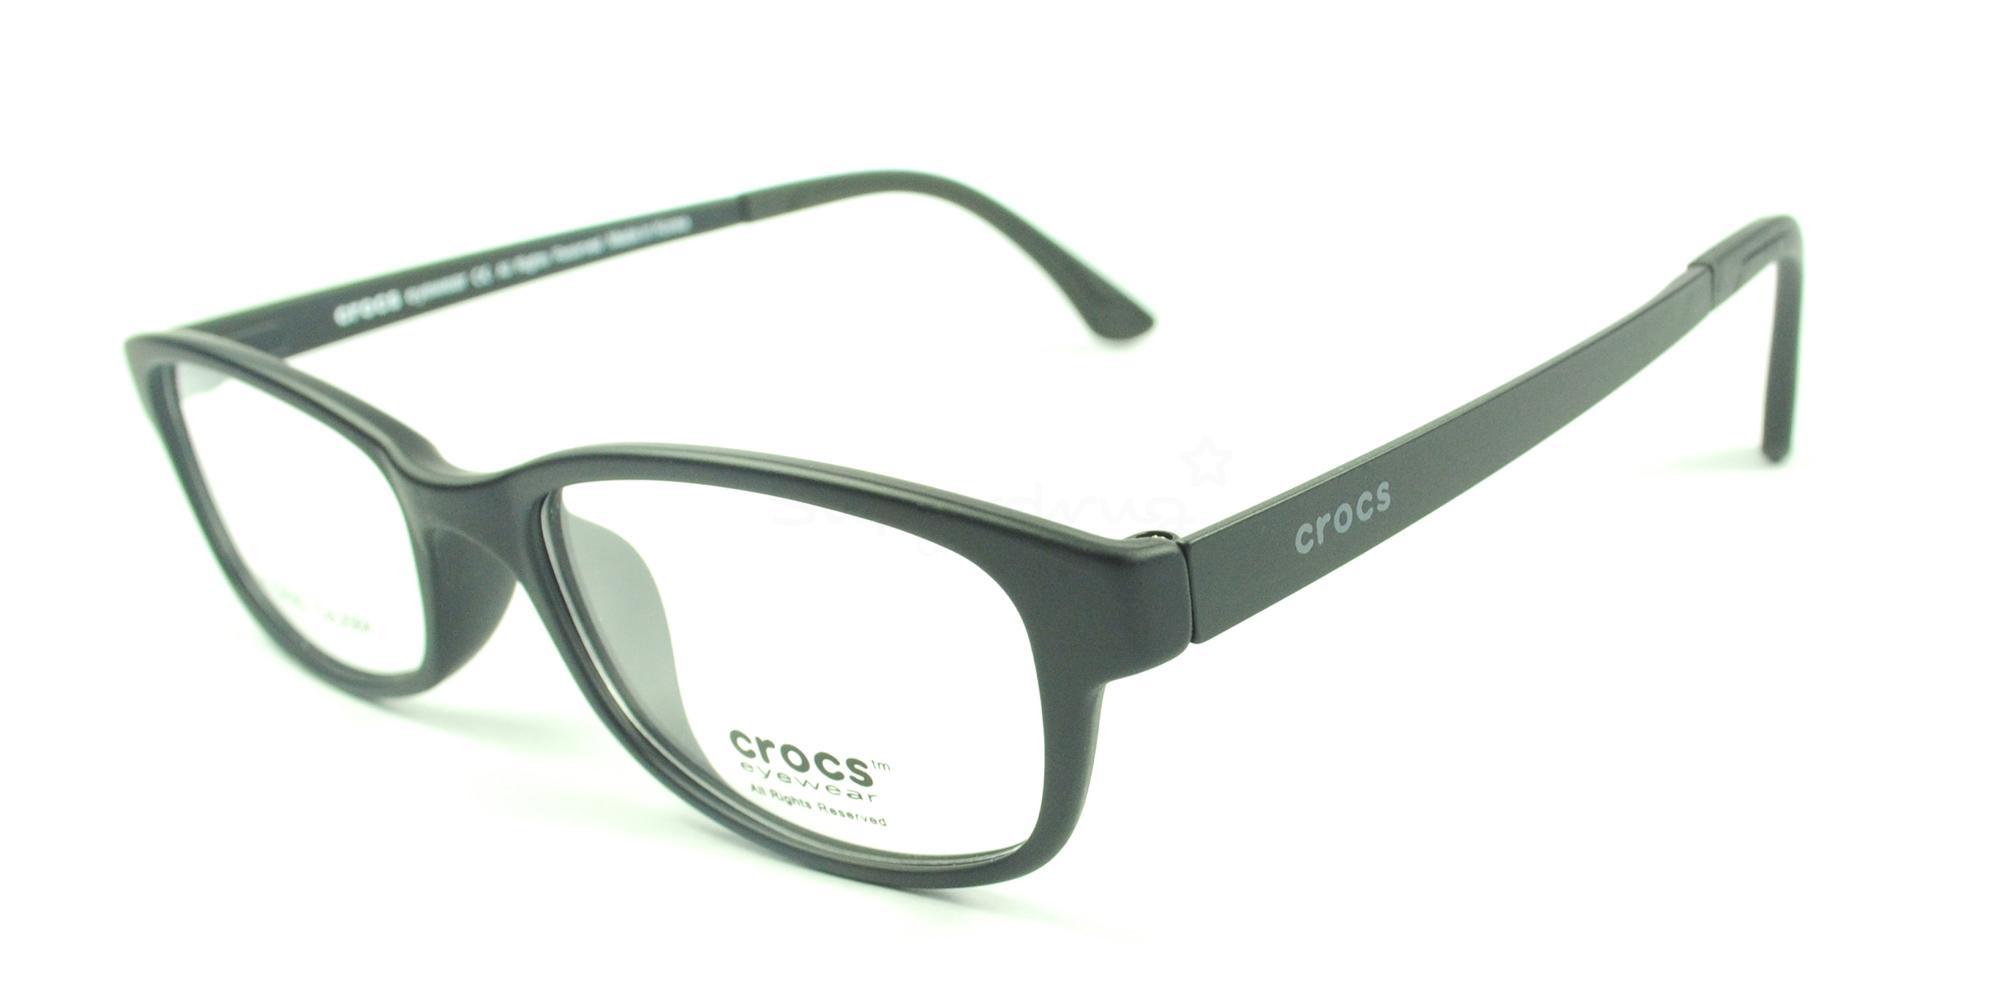 20BK CF620 , Crocs Eyewear